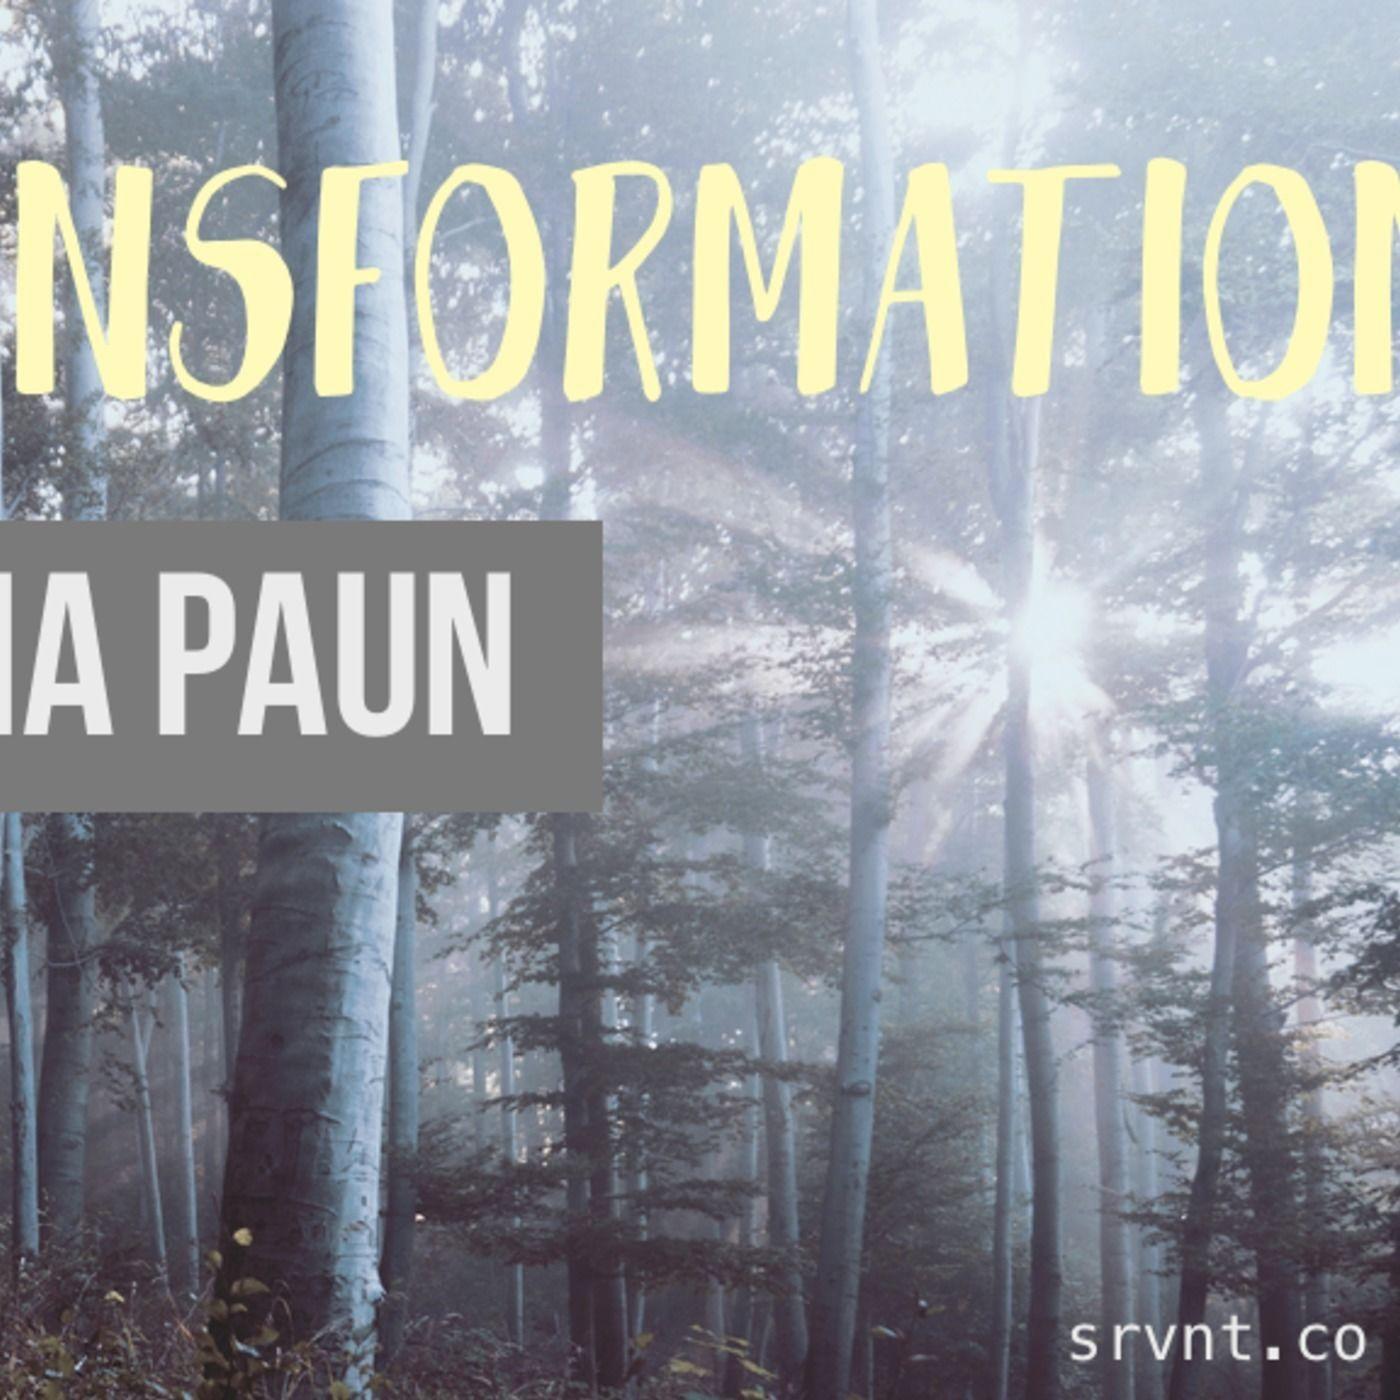 Transformation Episode 3: Corina Paun Searching in Romania to Serving God in Papua New Guinea